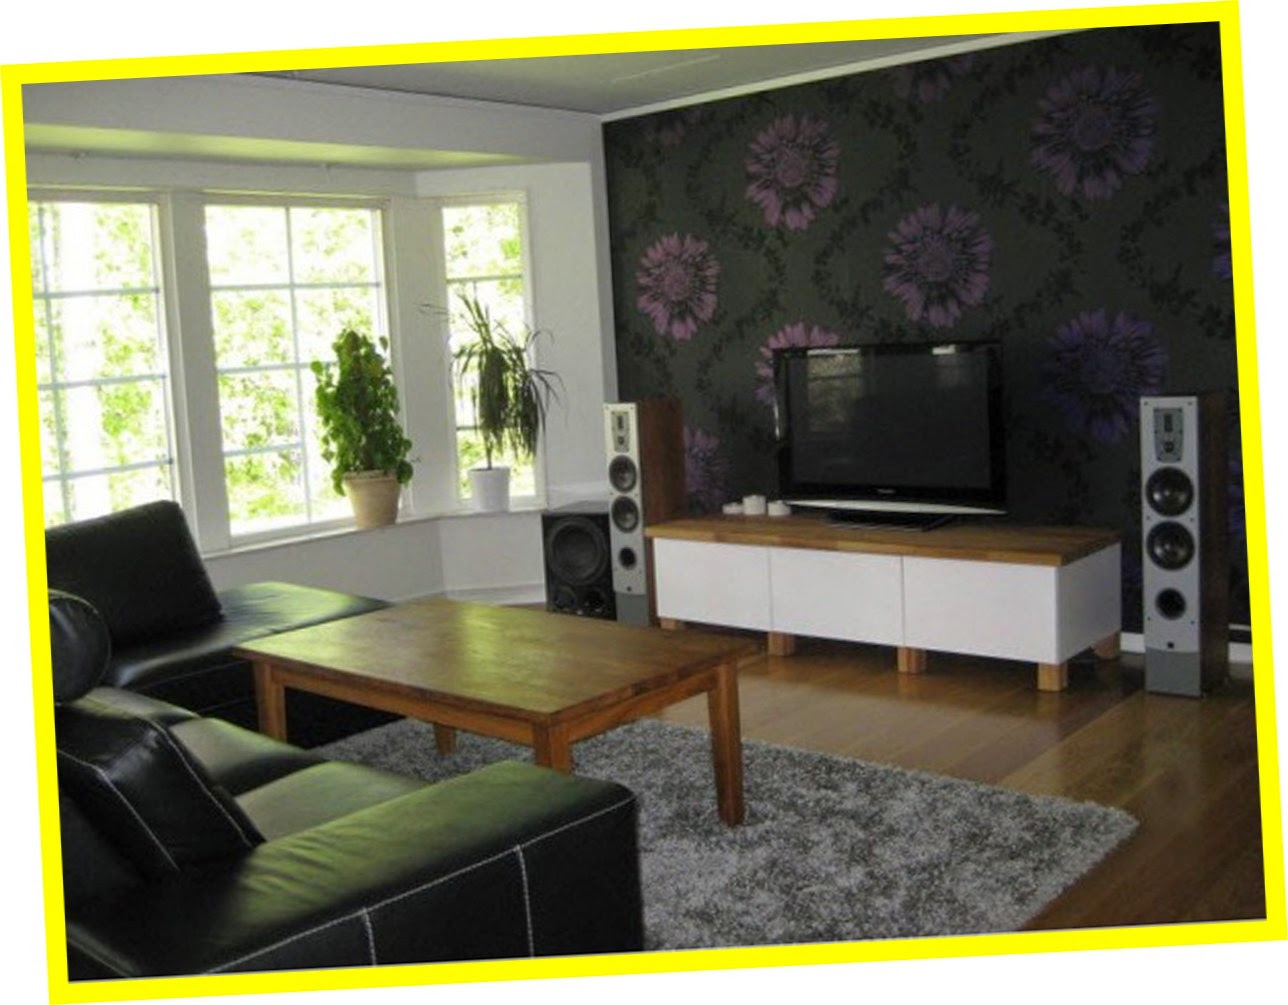 home design photos on pinterest famous interior designers nyc - Famous Home Designers